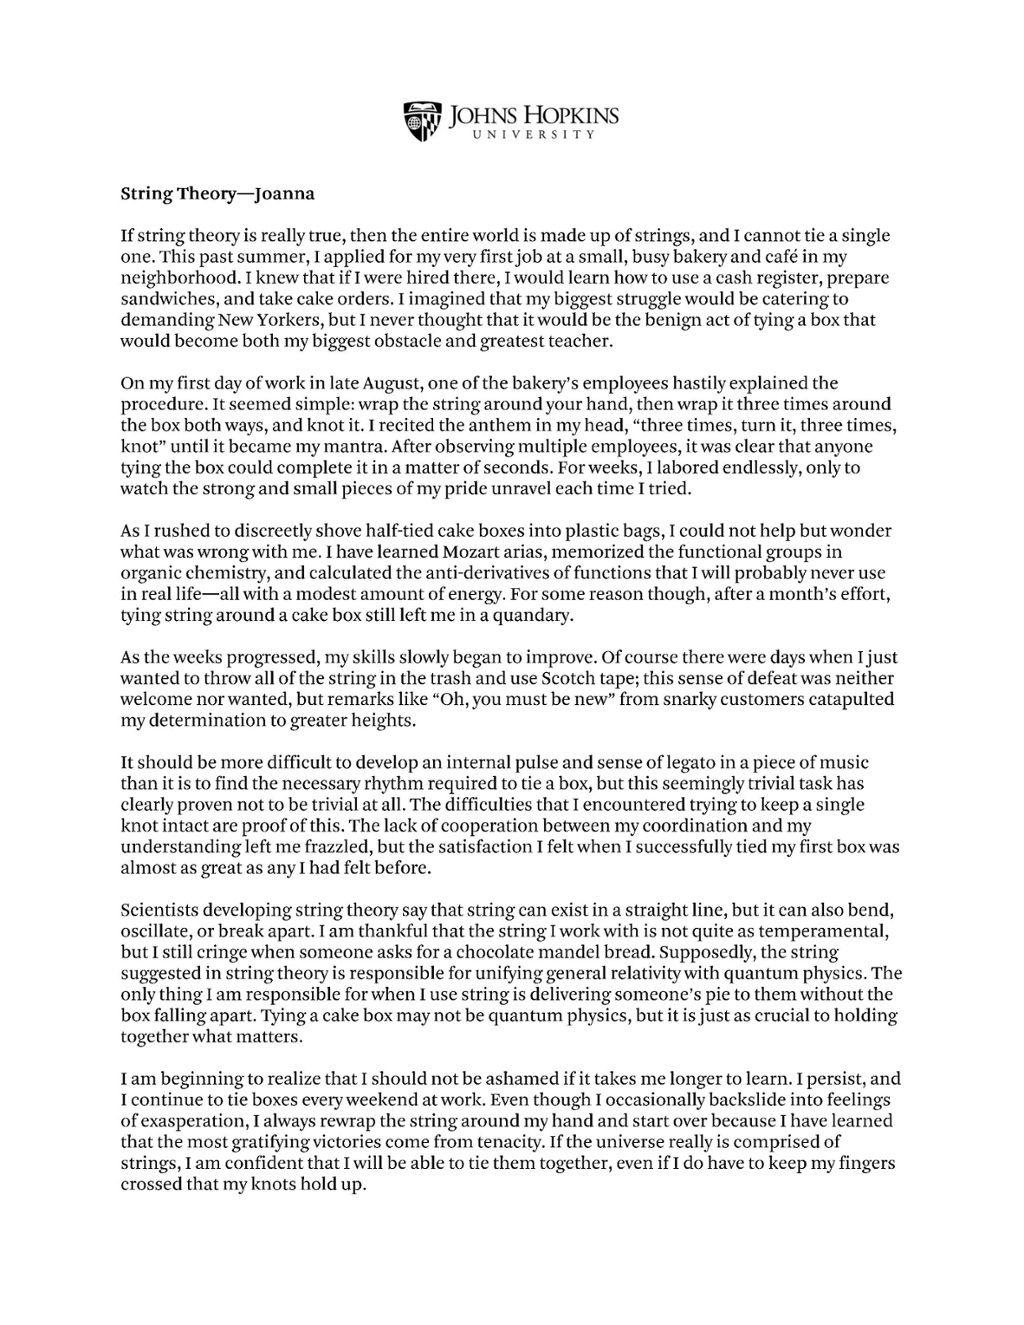 002 Johns Hopkins Essay Staggering University Prompts Supplemental Tips John Examples Full